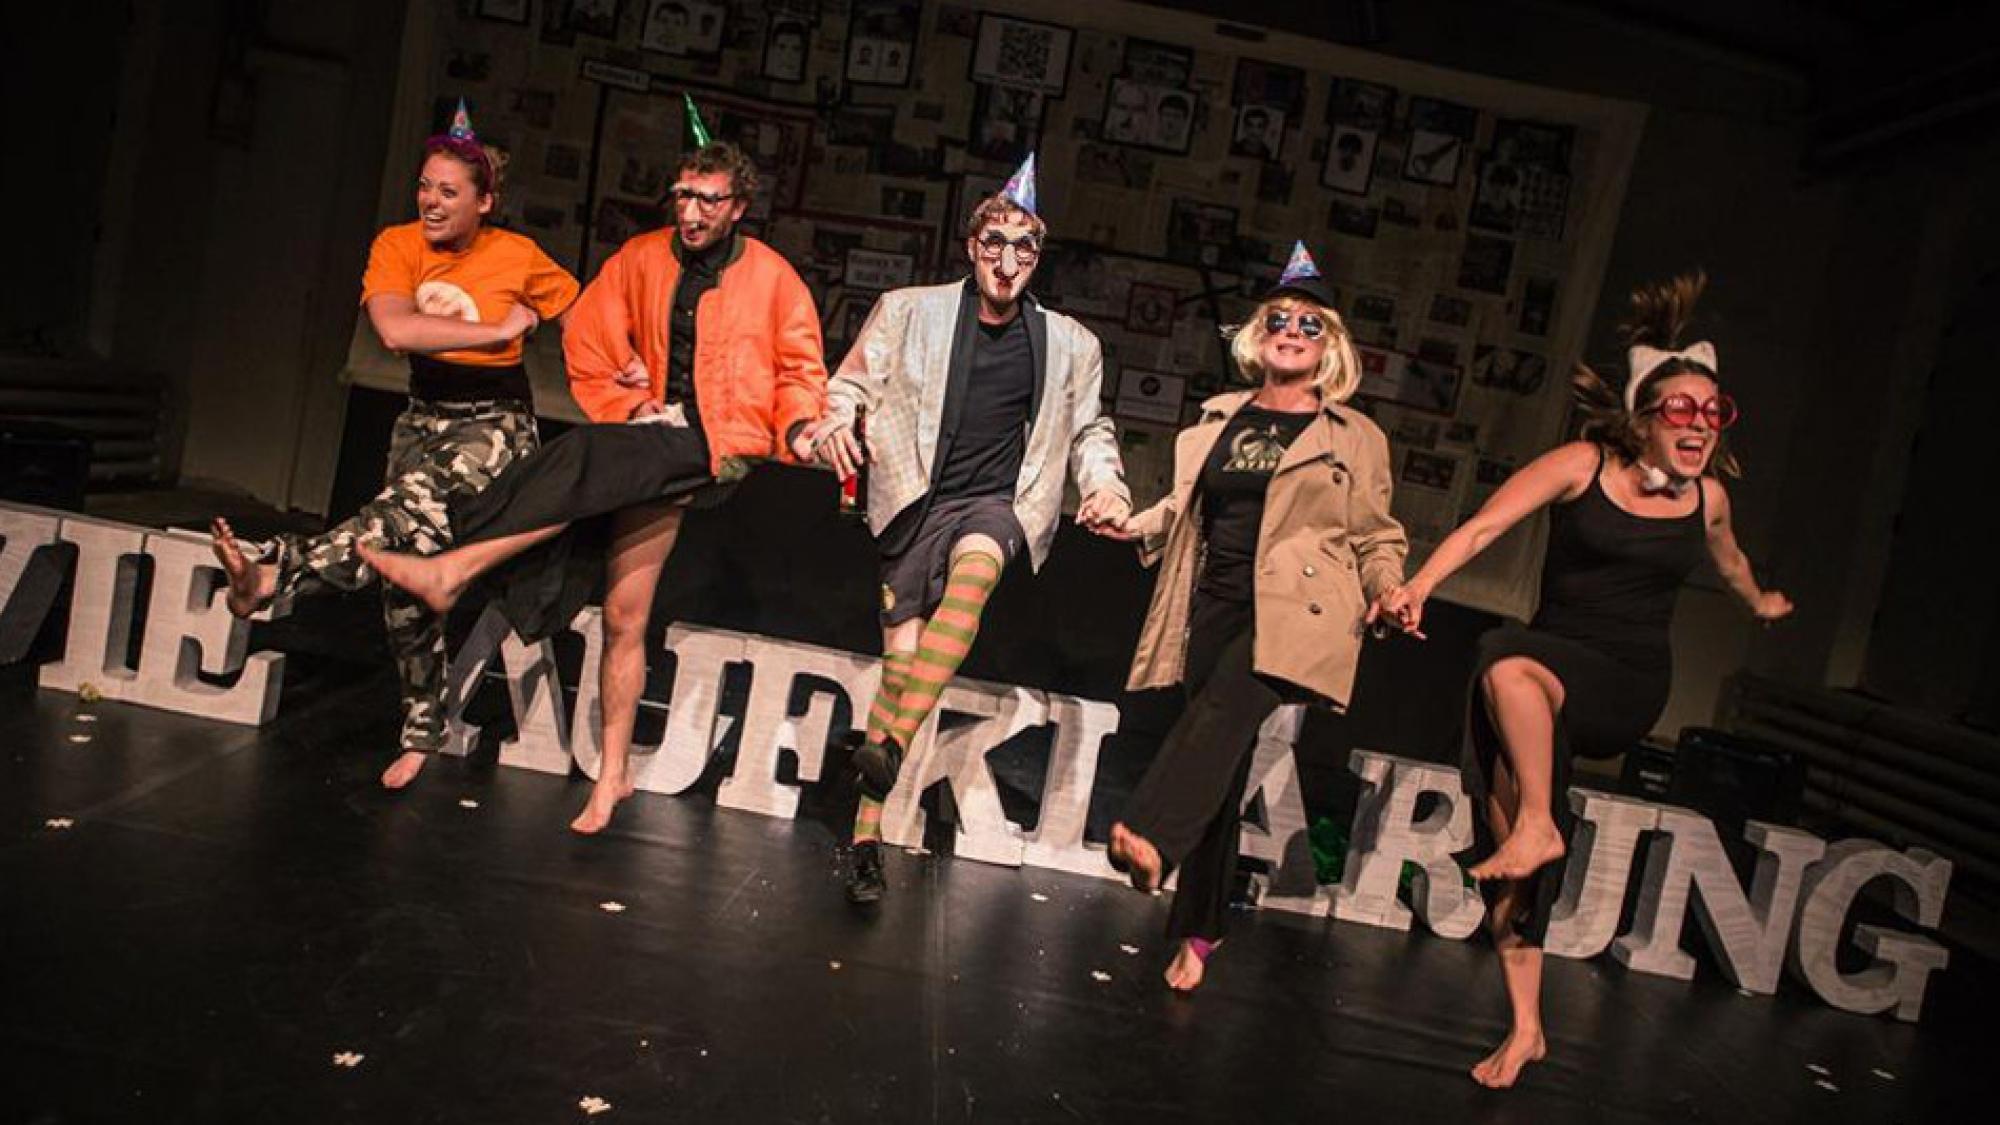 nötheater_AwieAuflärung, Foto: Klaudius Dziuk